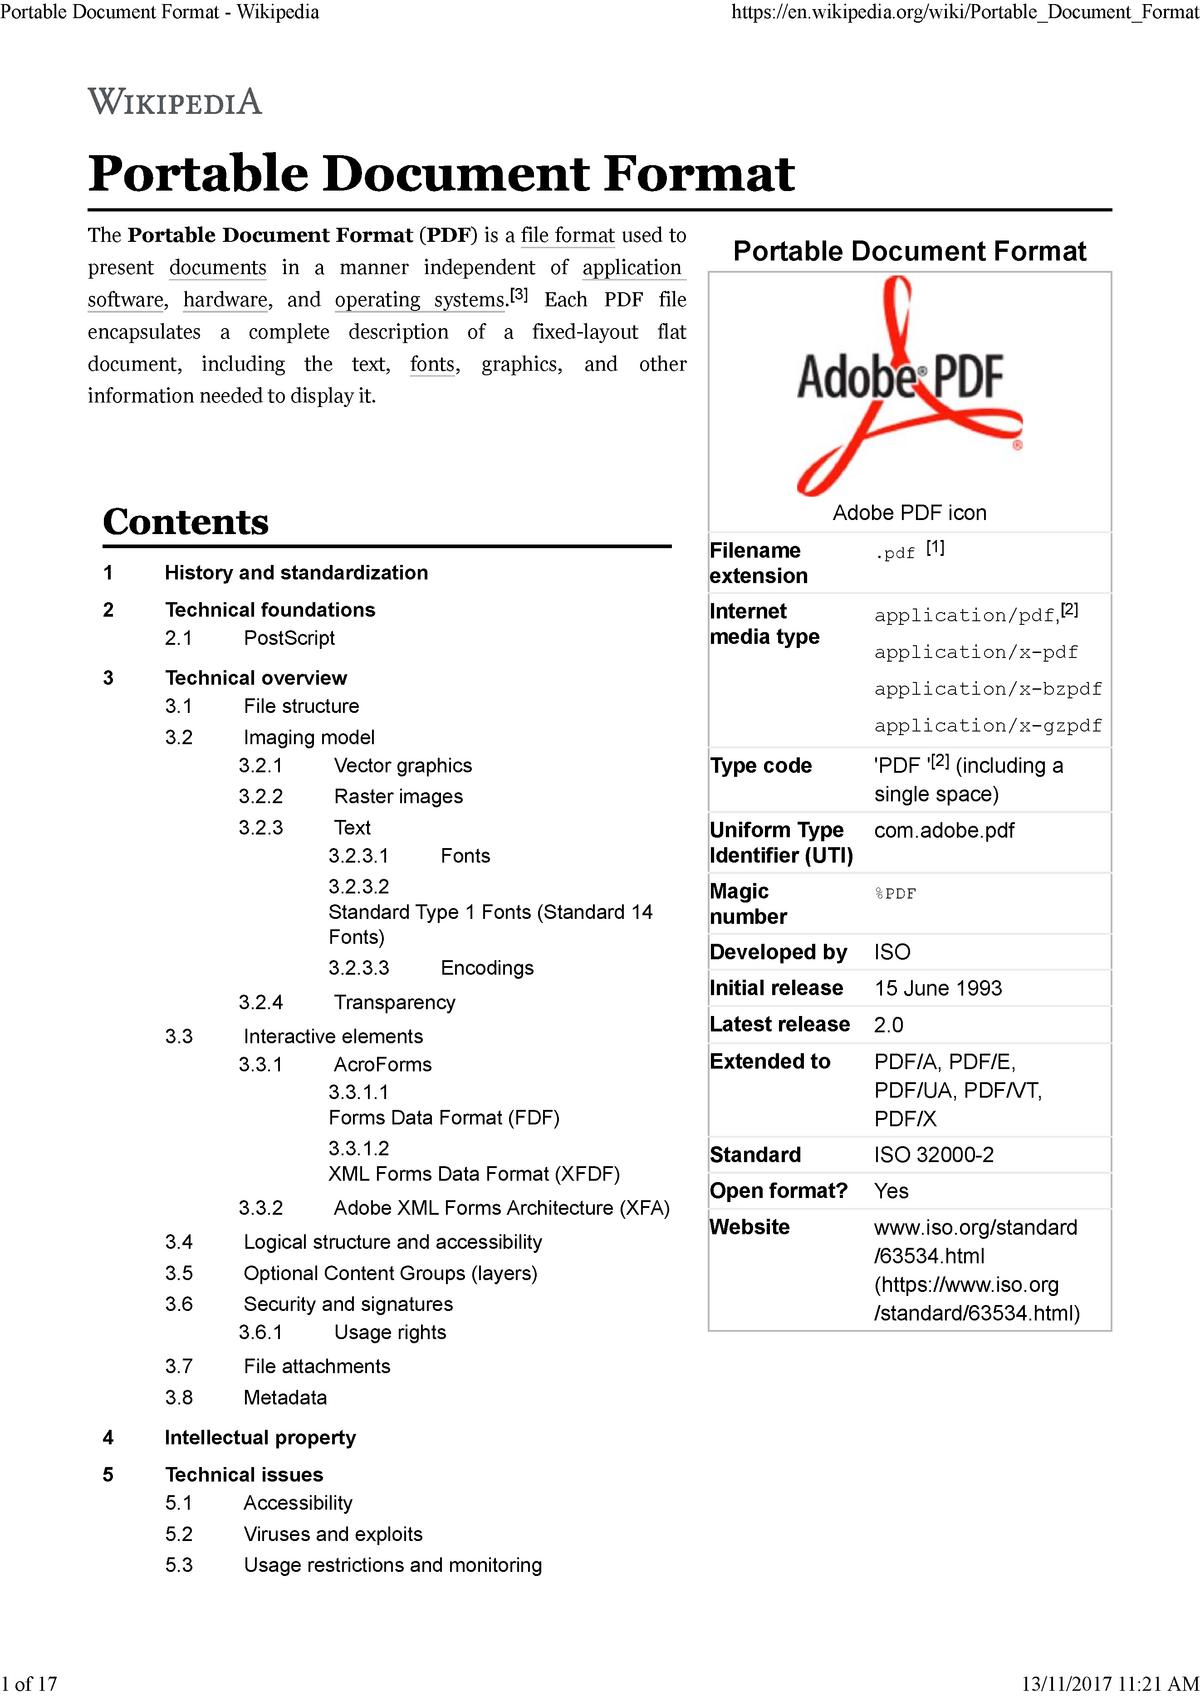 Portable Document Format - WikipediaPDF - C003341: Stratigrafie